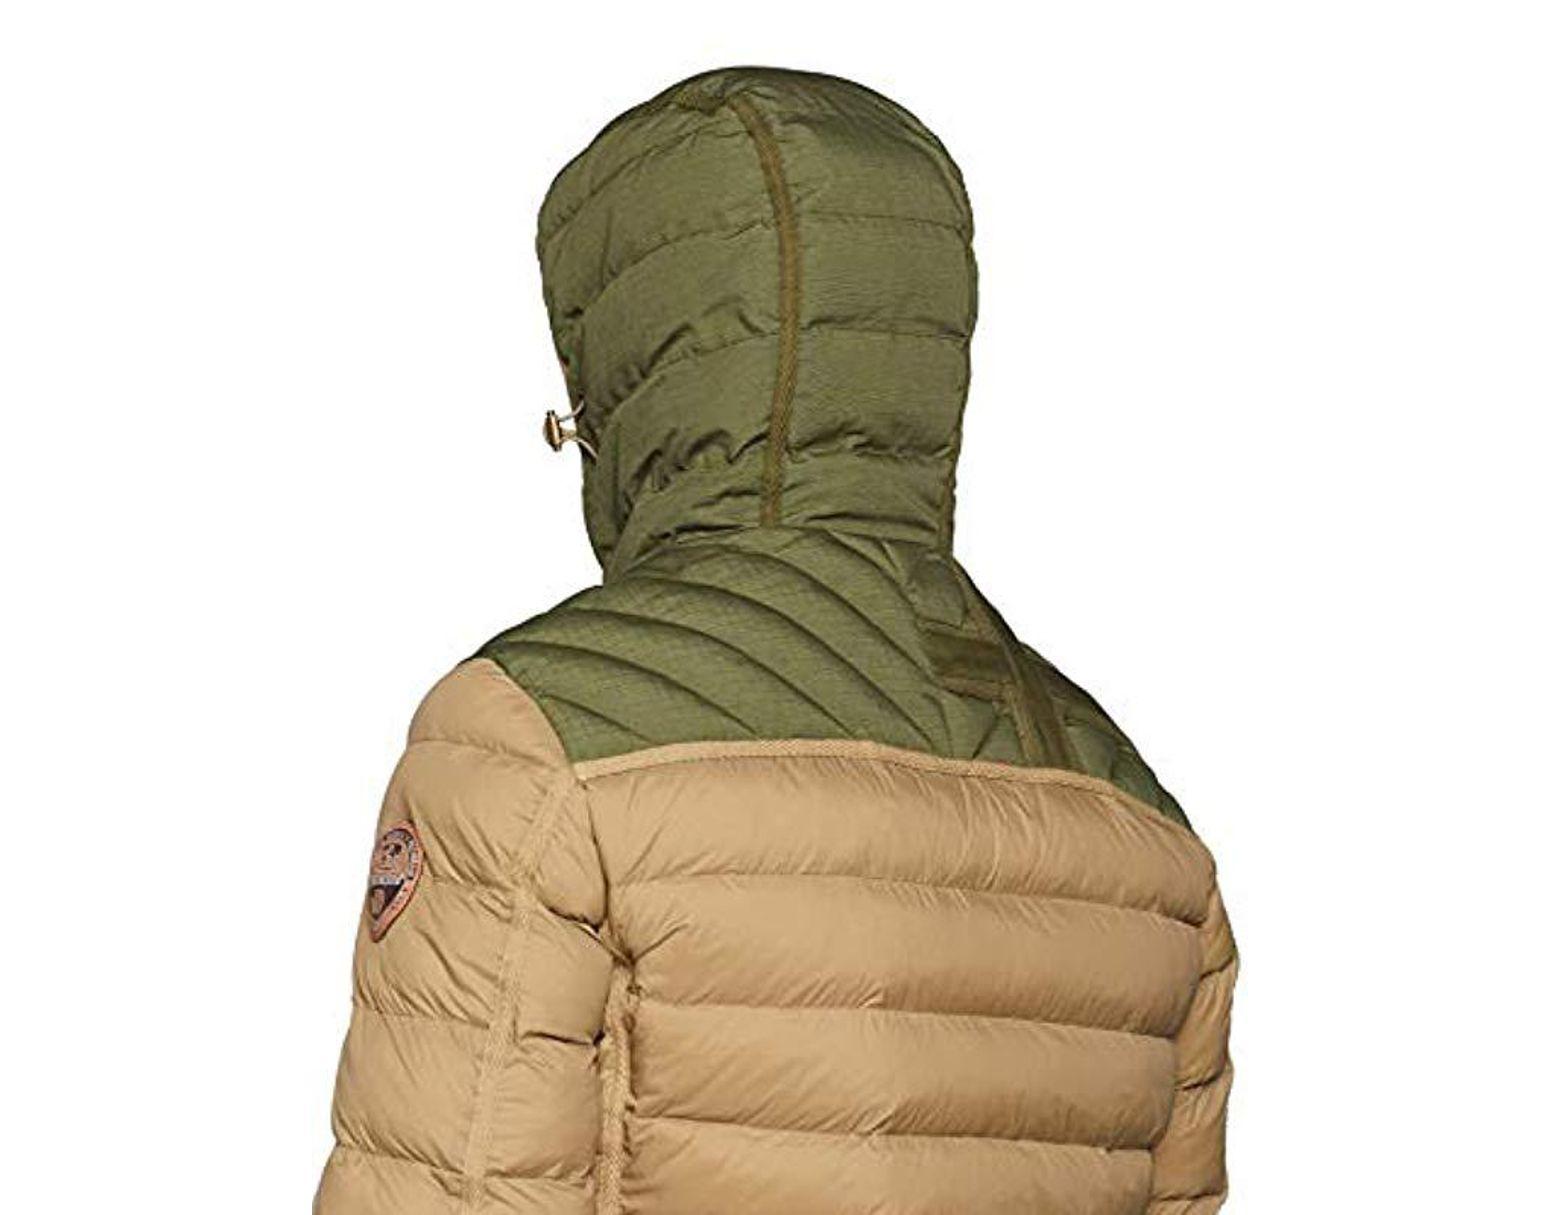 67abf566f6be8 Napapijri Articage Jacke Jacket in Natural for Men - Lyst